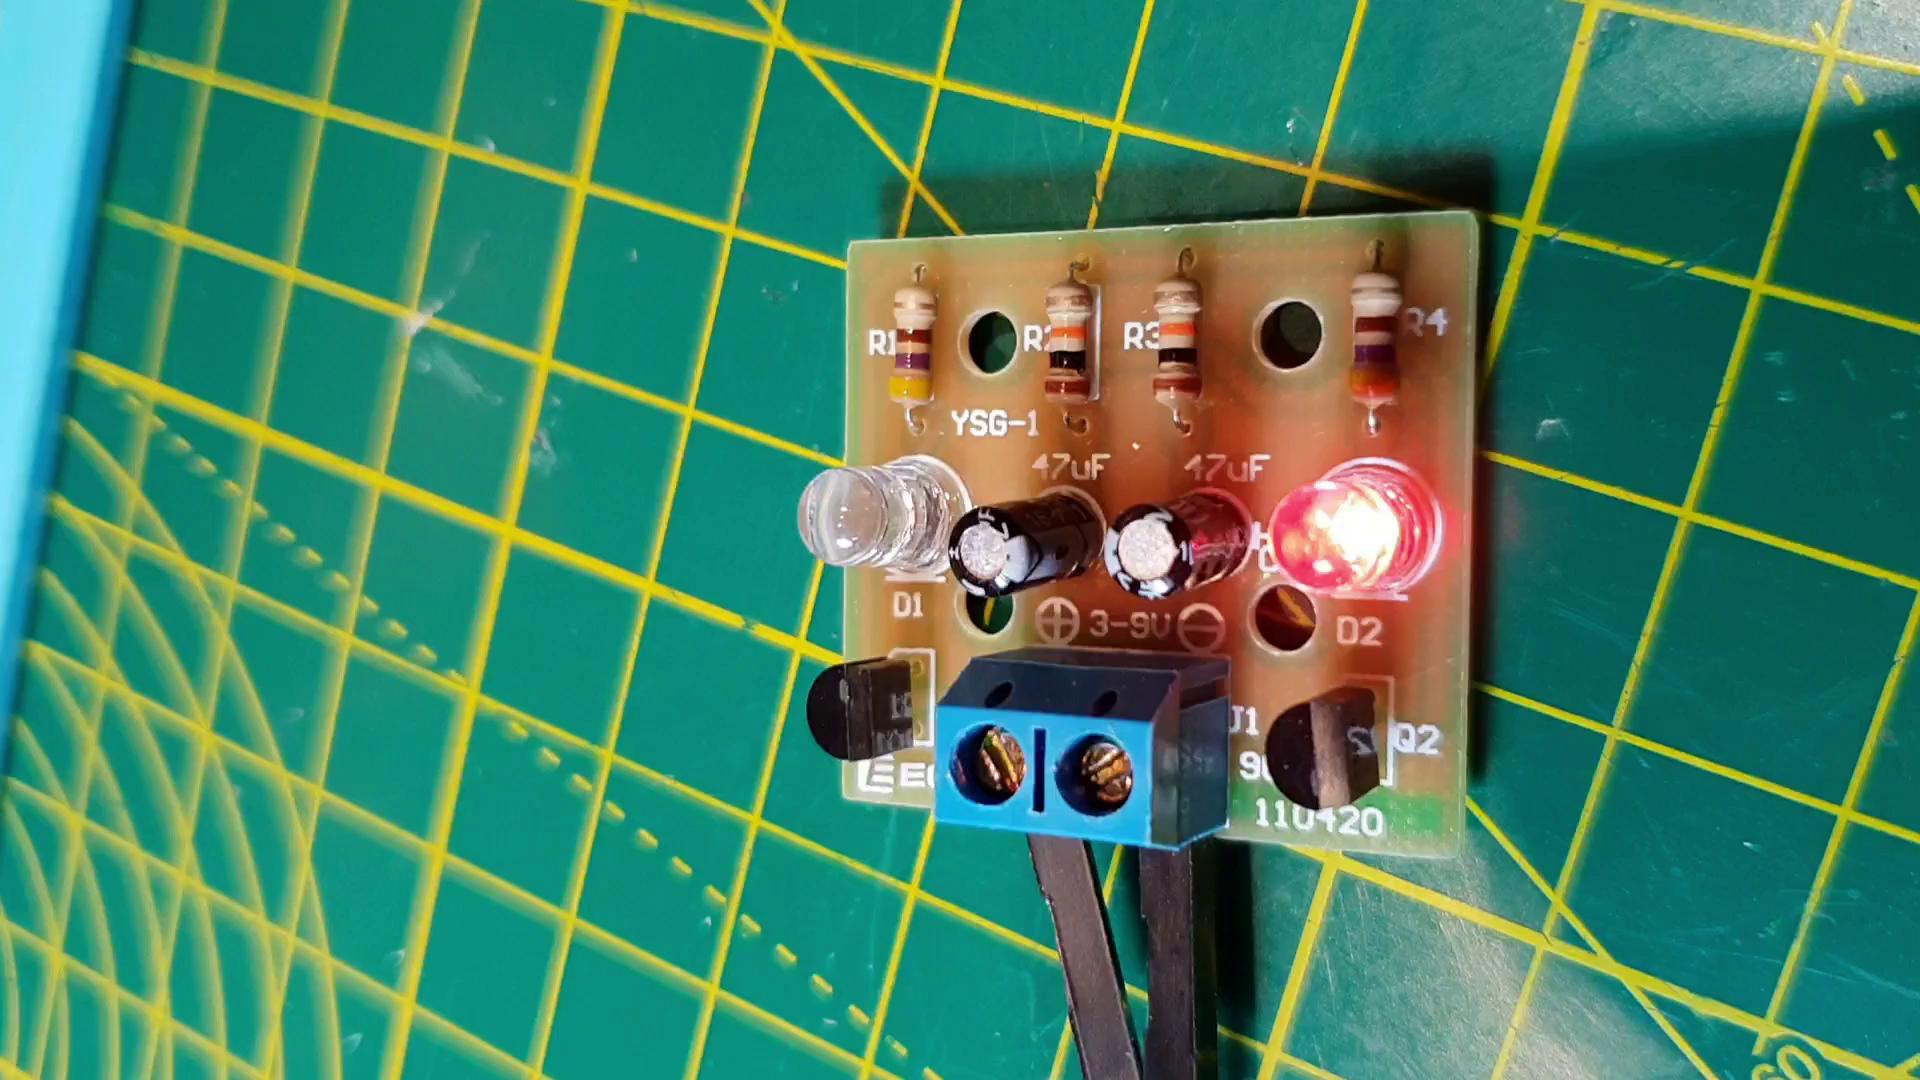 Hiletgo 2pcs Led Flash Light Circuit Production Electronic Project Diy Suite Kits Module Board Set For Student Exercise Business